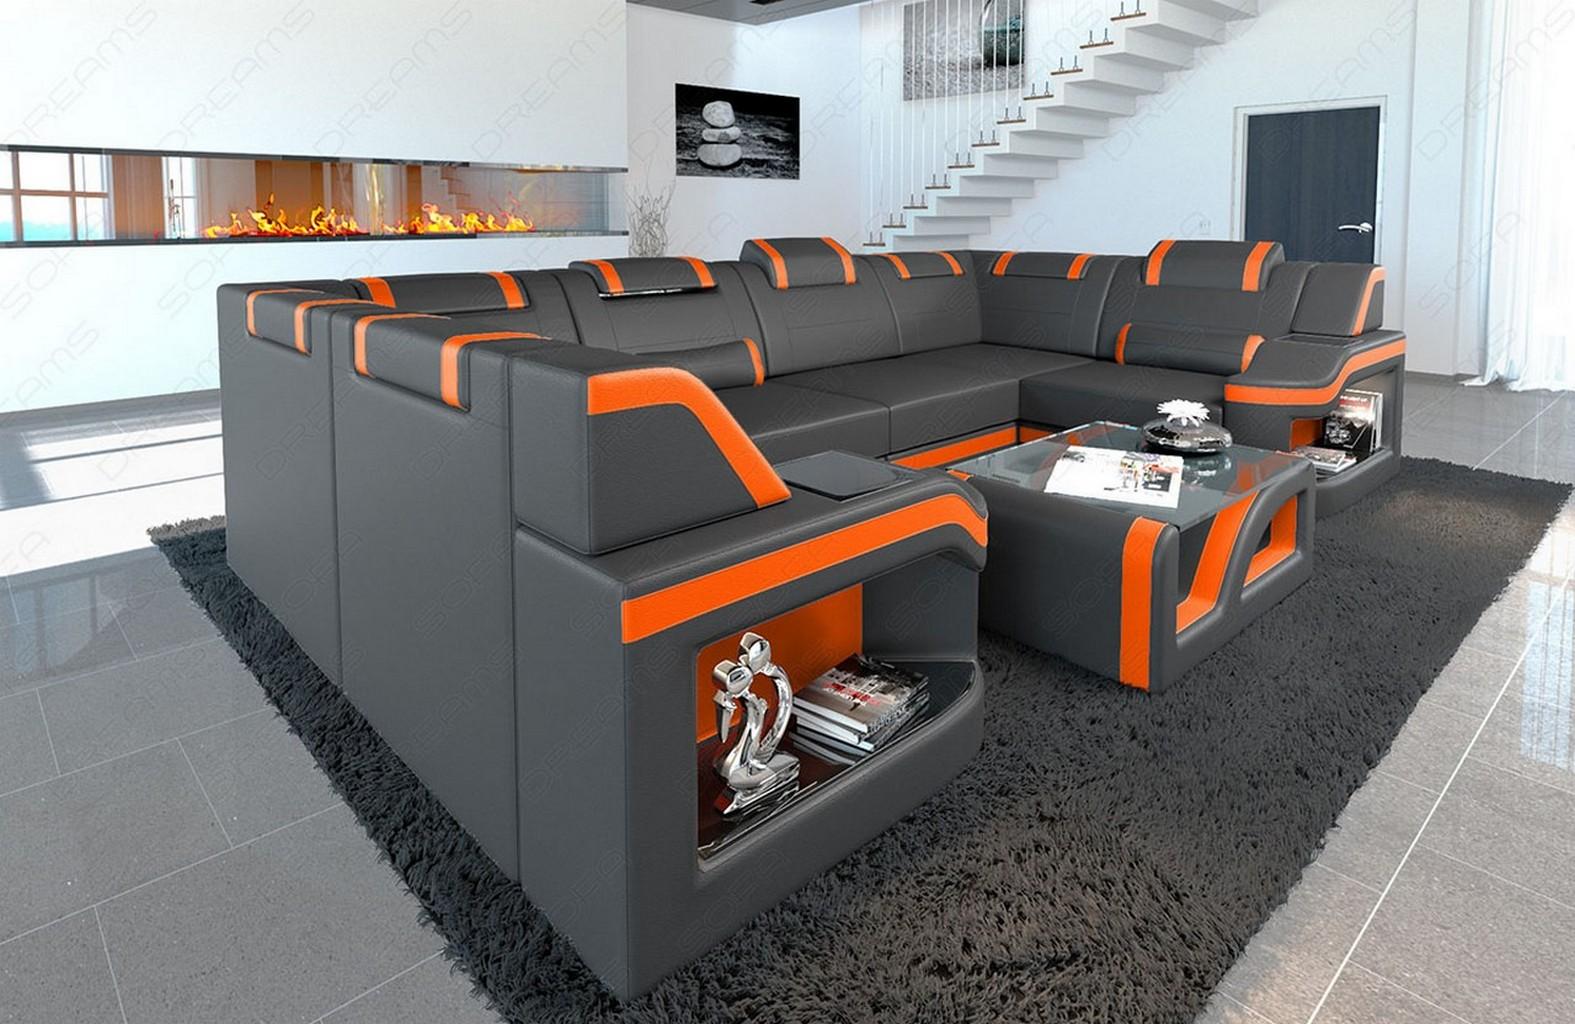 Details about Modern Living Room Leather Sectional Sofa Manhattan U Shape  Adjustable Headrest